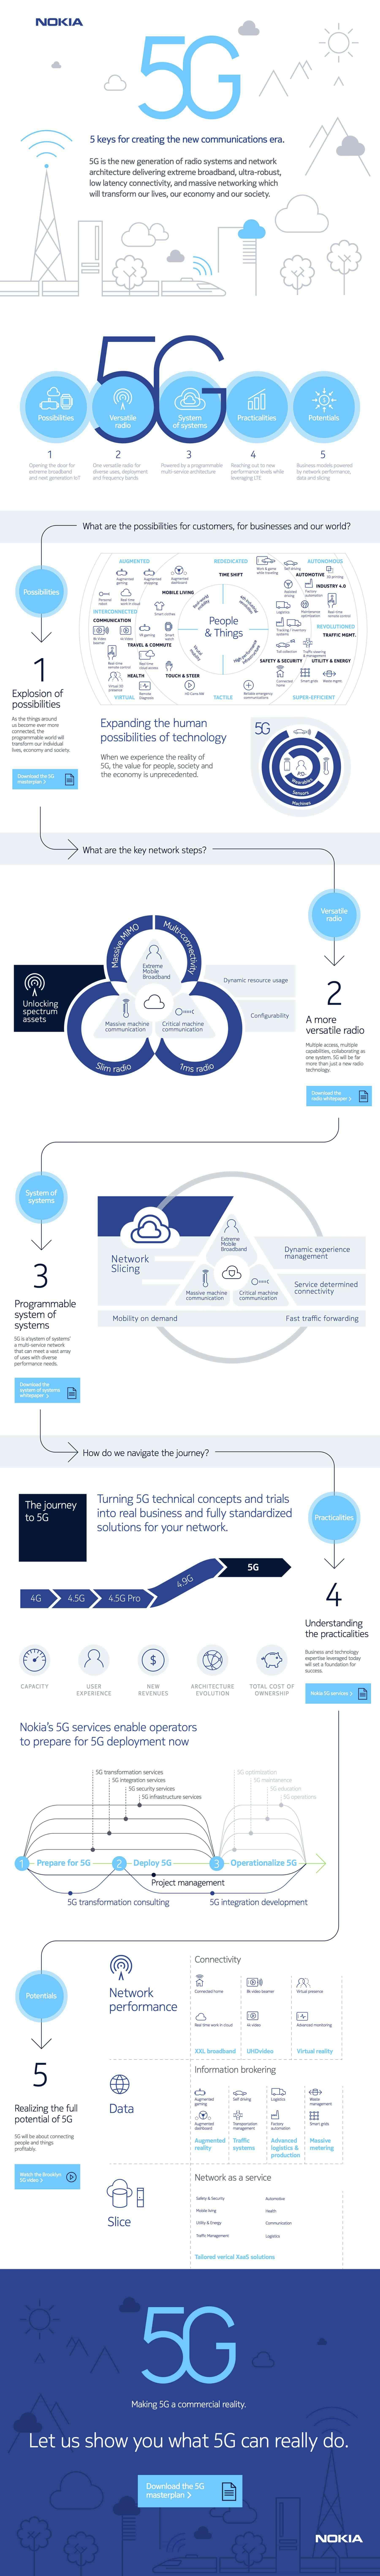 infografia 5g nokia